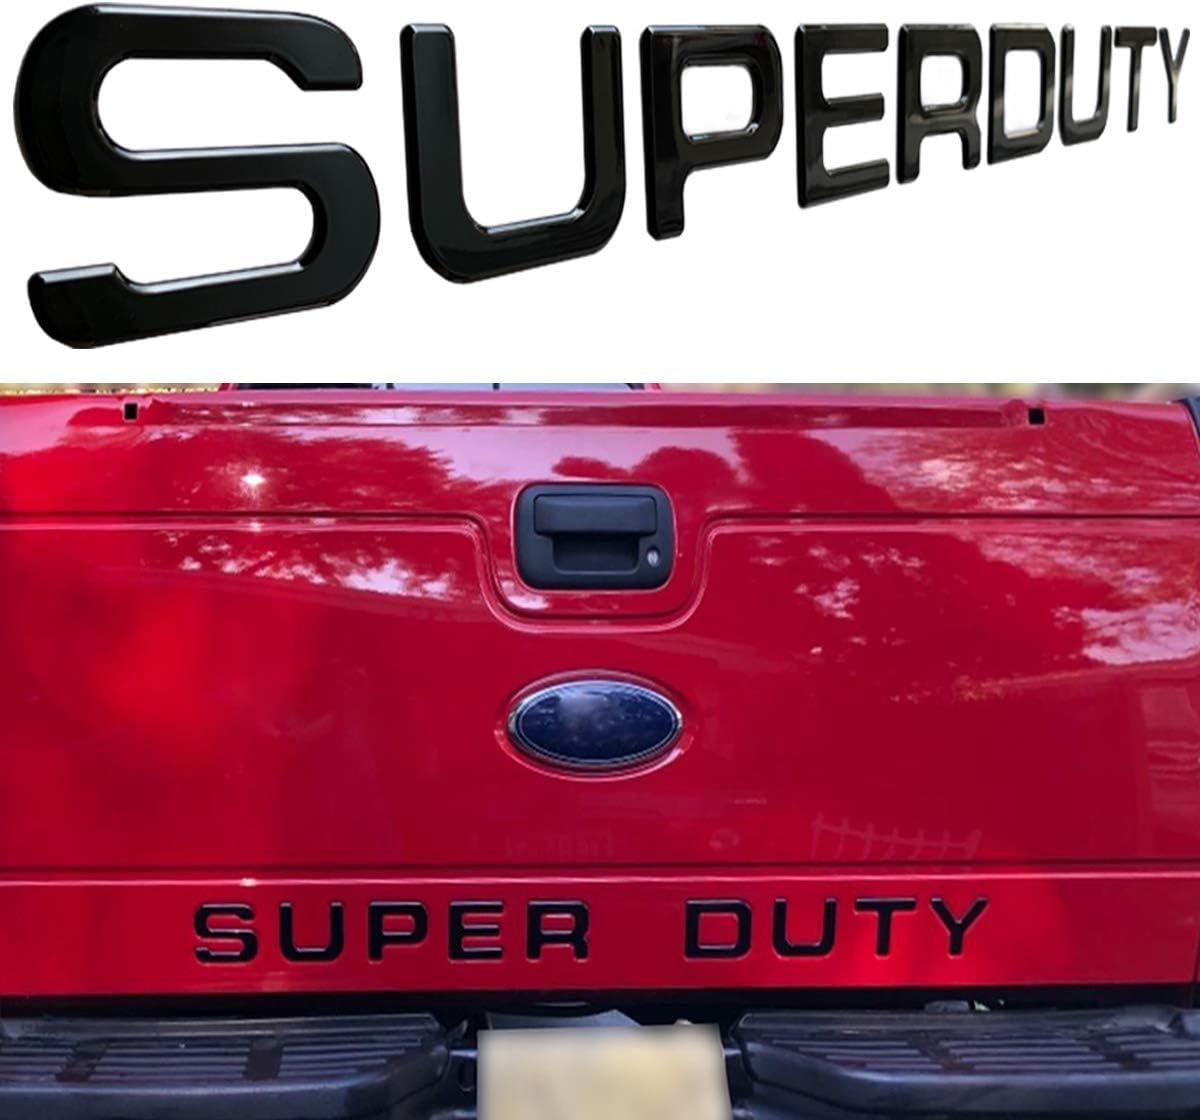 KENPENRI Tailgate Insert Letters for Ford Super Duty 2008-2016 3M Adhesive /& 3D Raised Tailgate Letters Matte Black